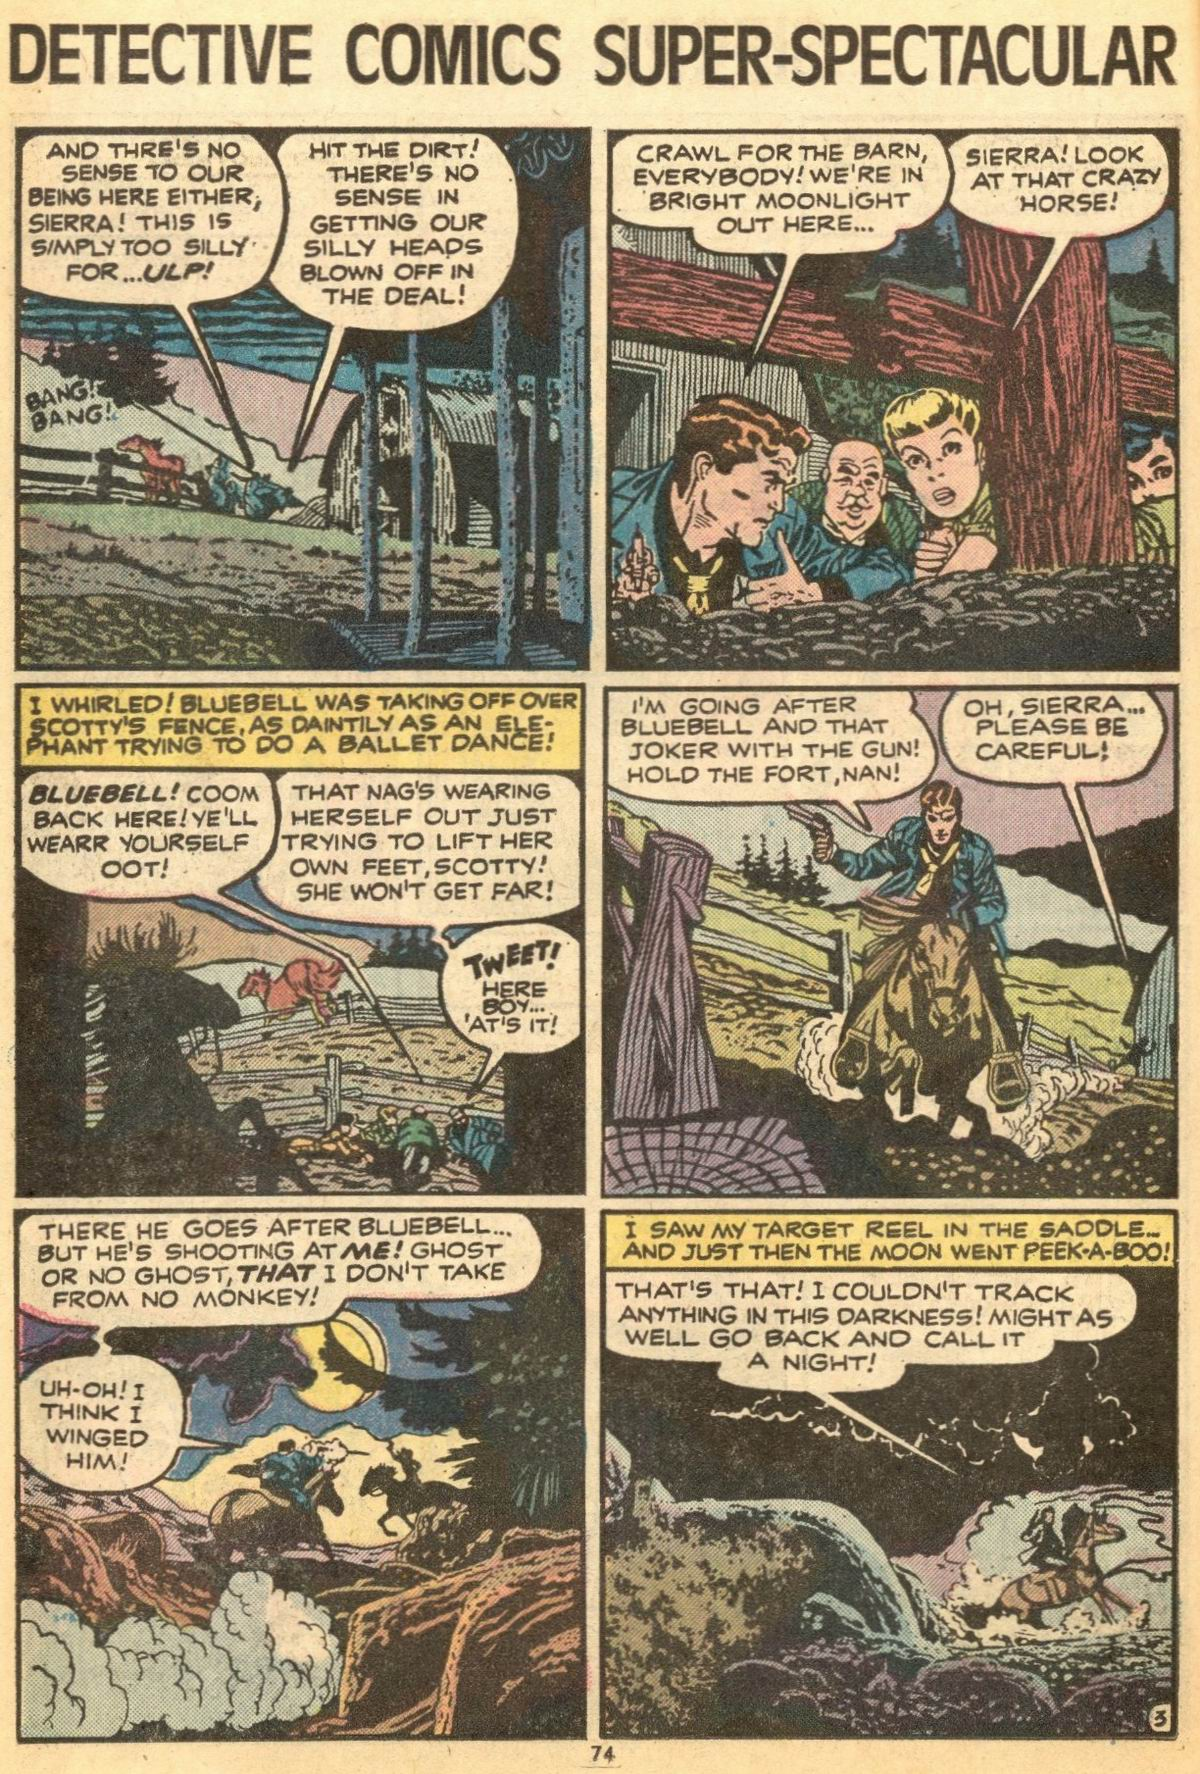 Detective Comics (1937) 444 Page 73